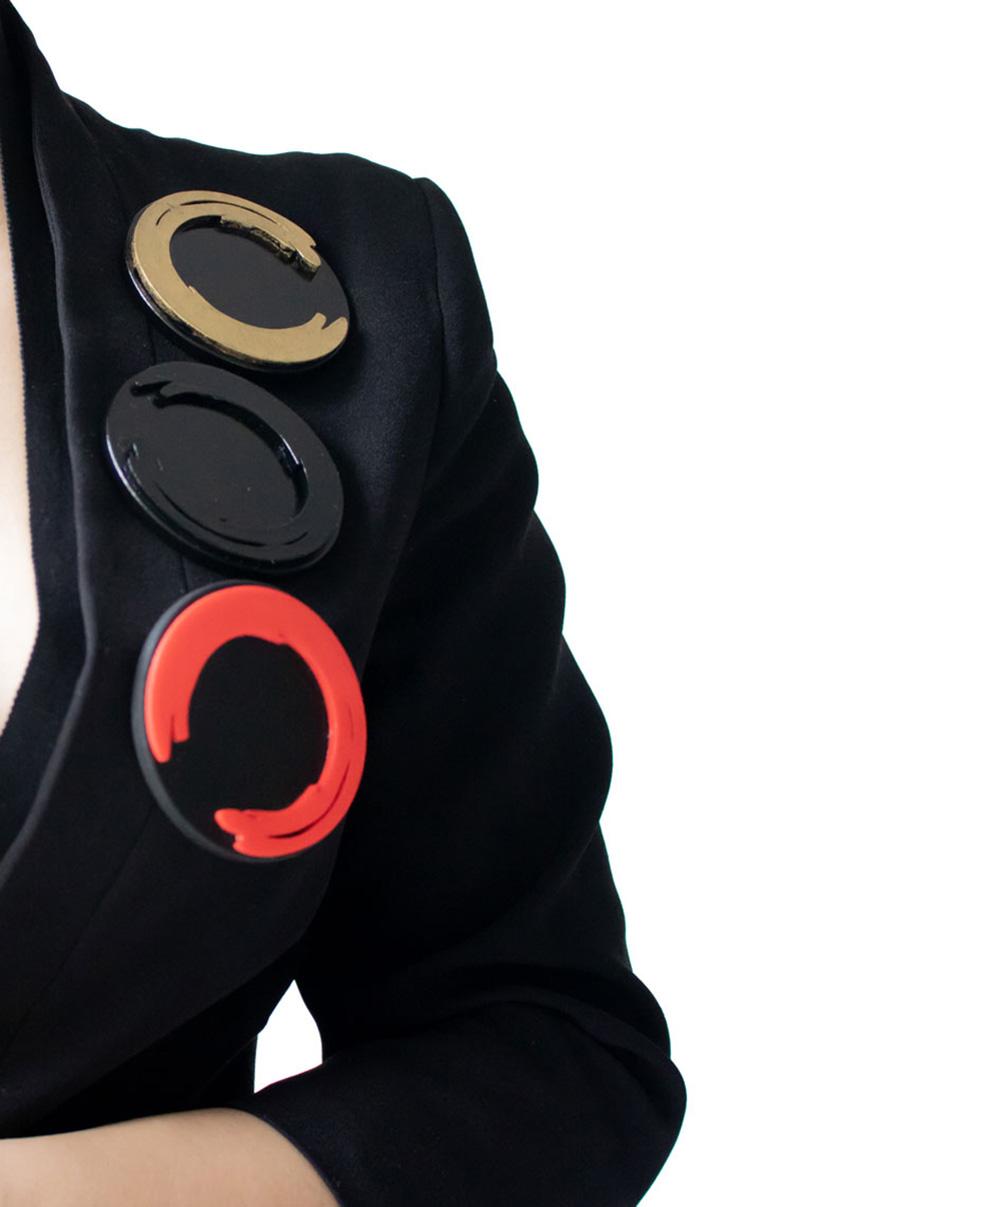 Nobahar Design Milano - contemporary design jewelry - My inner freedom - enso - brooch